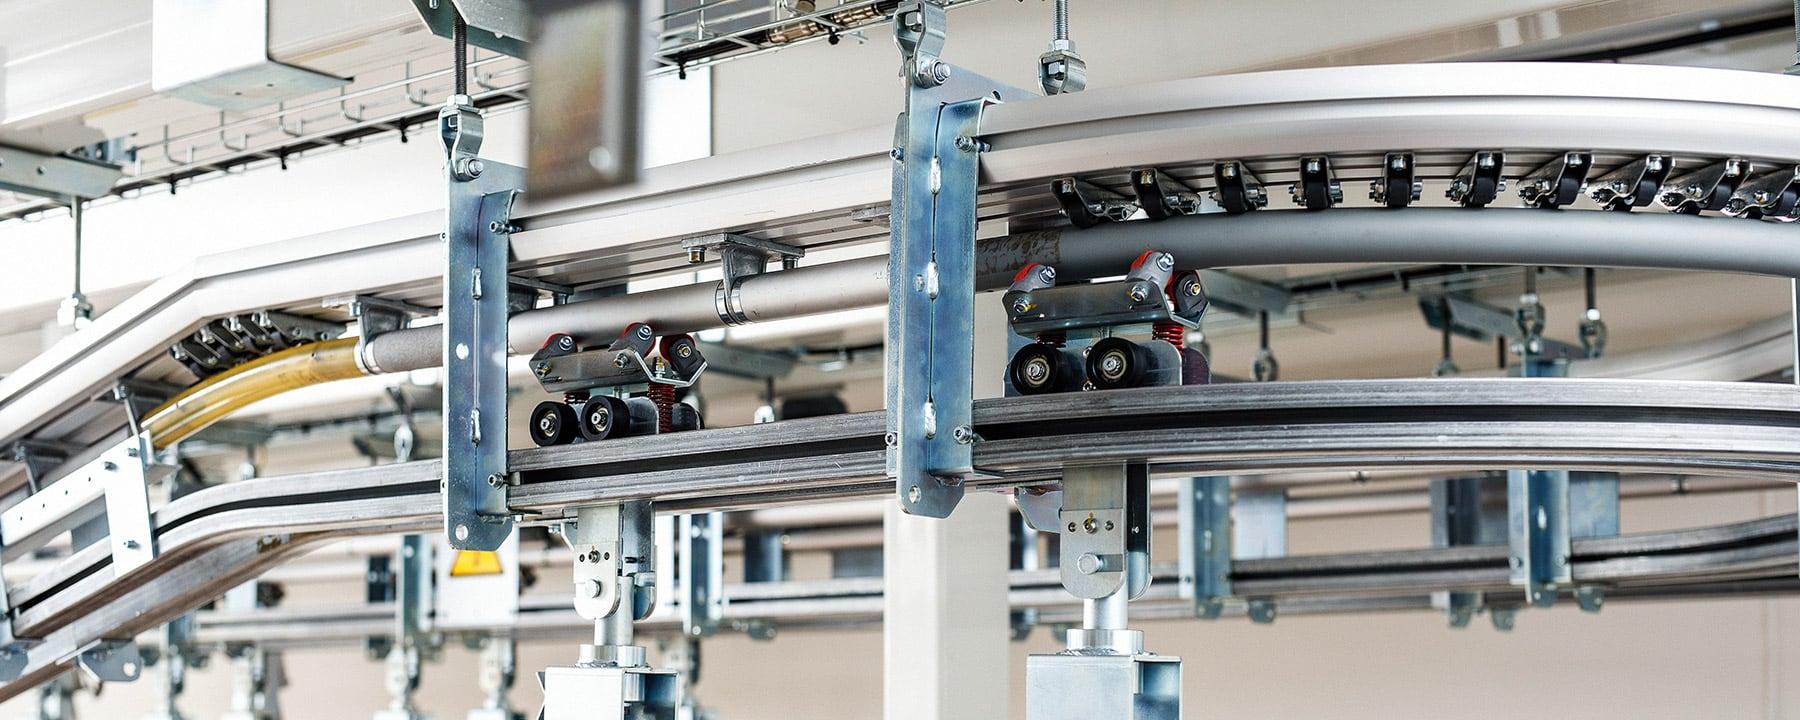 Overhead Conveyor System – OCS 500